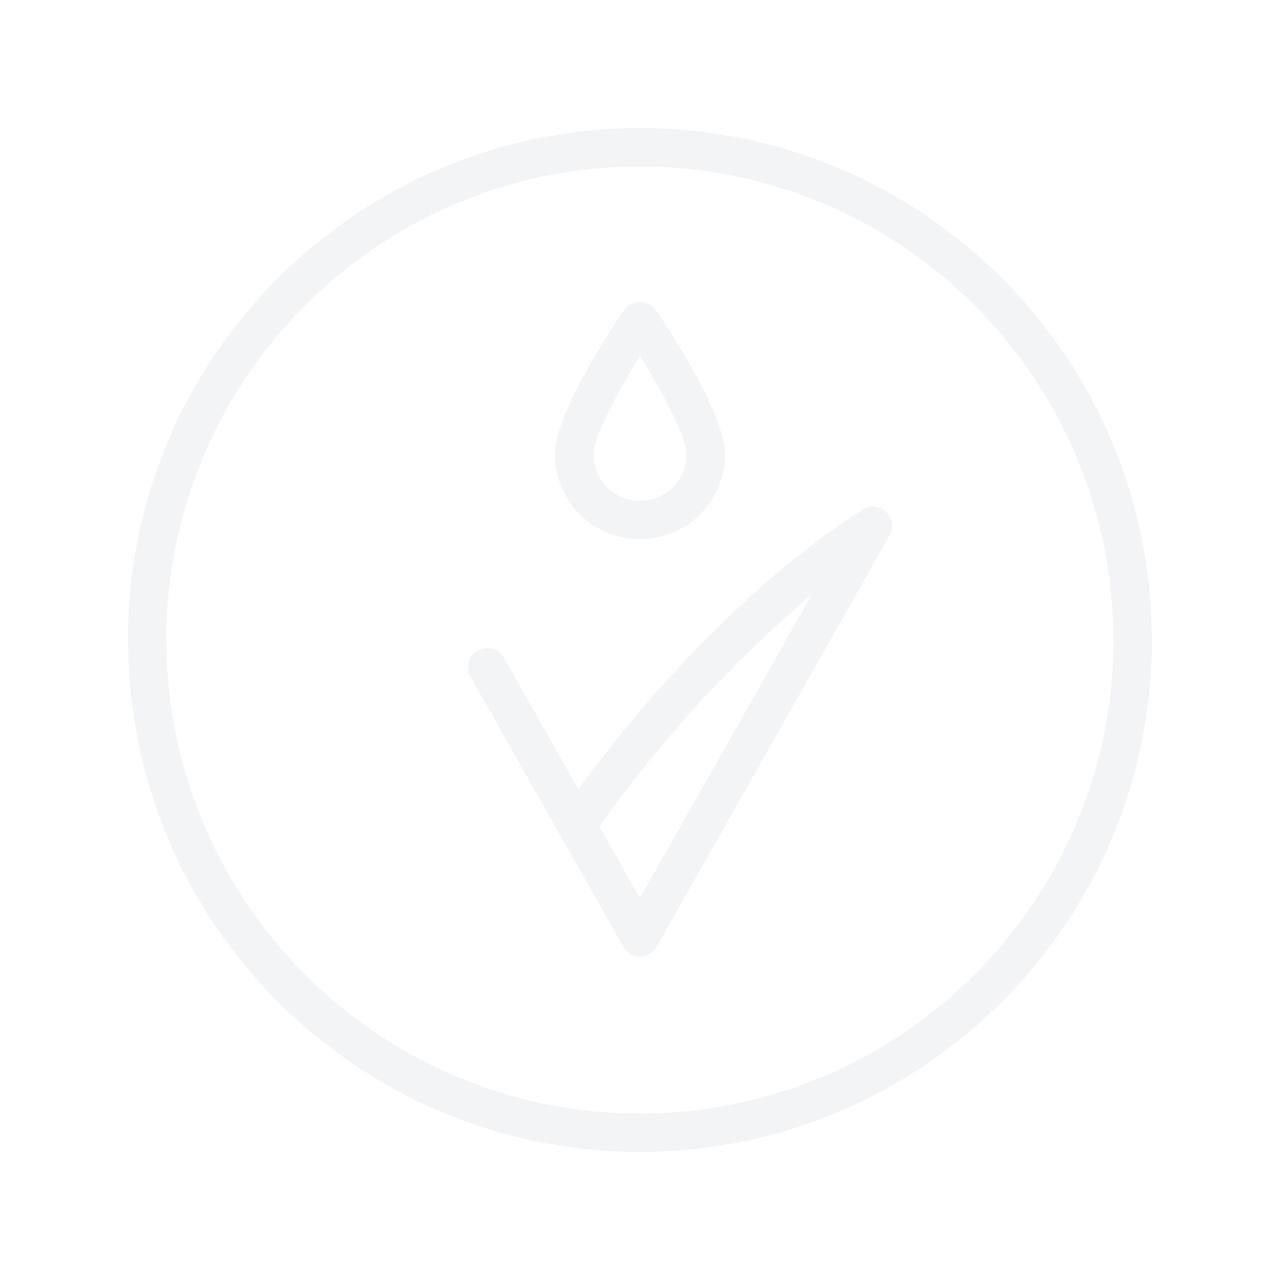 WELLA PROFESSIONALS Elements Mask 150ml